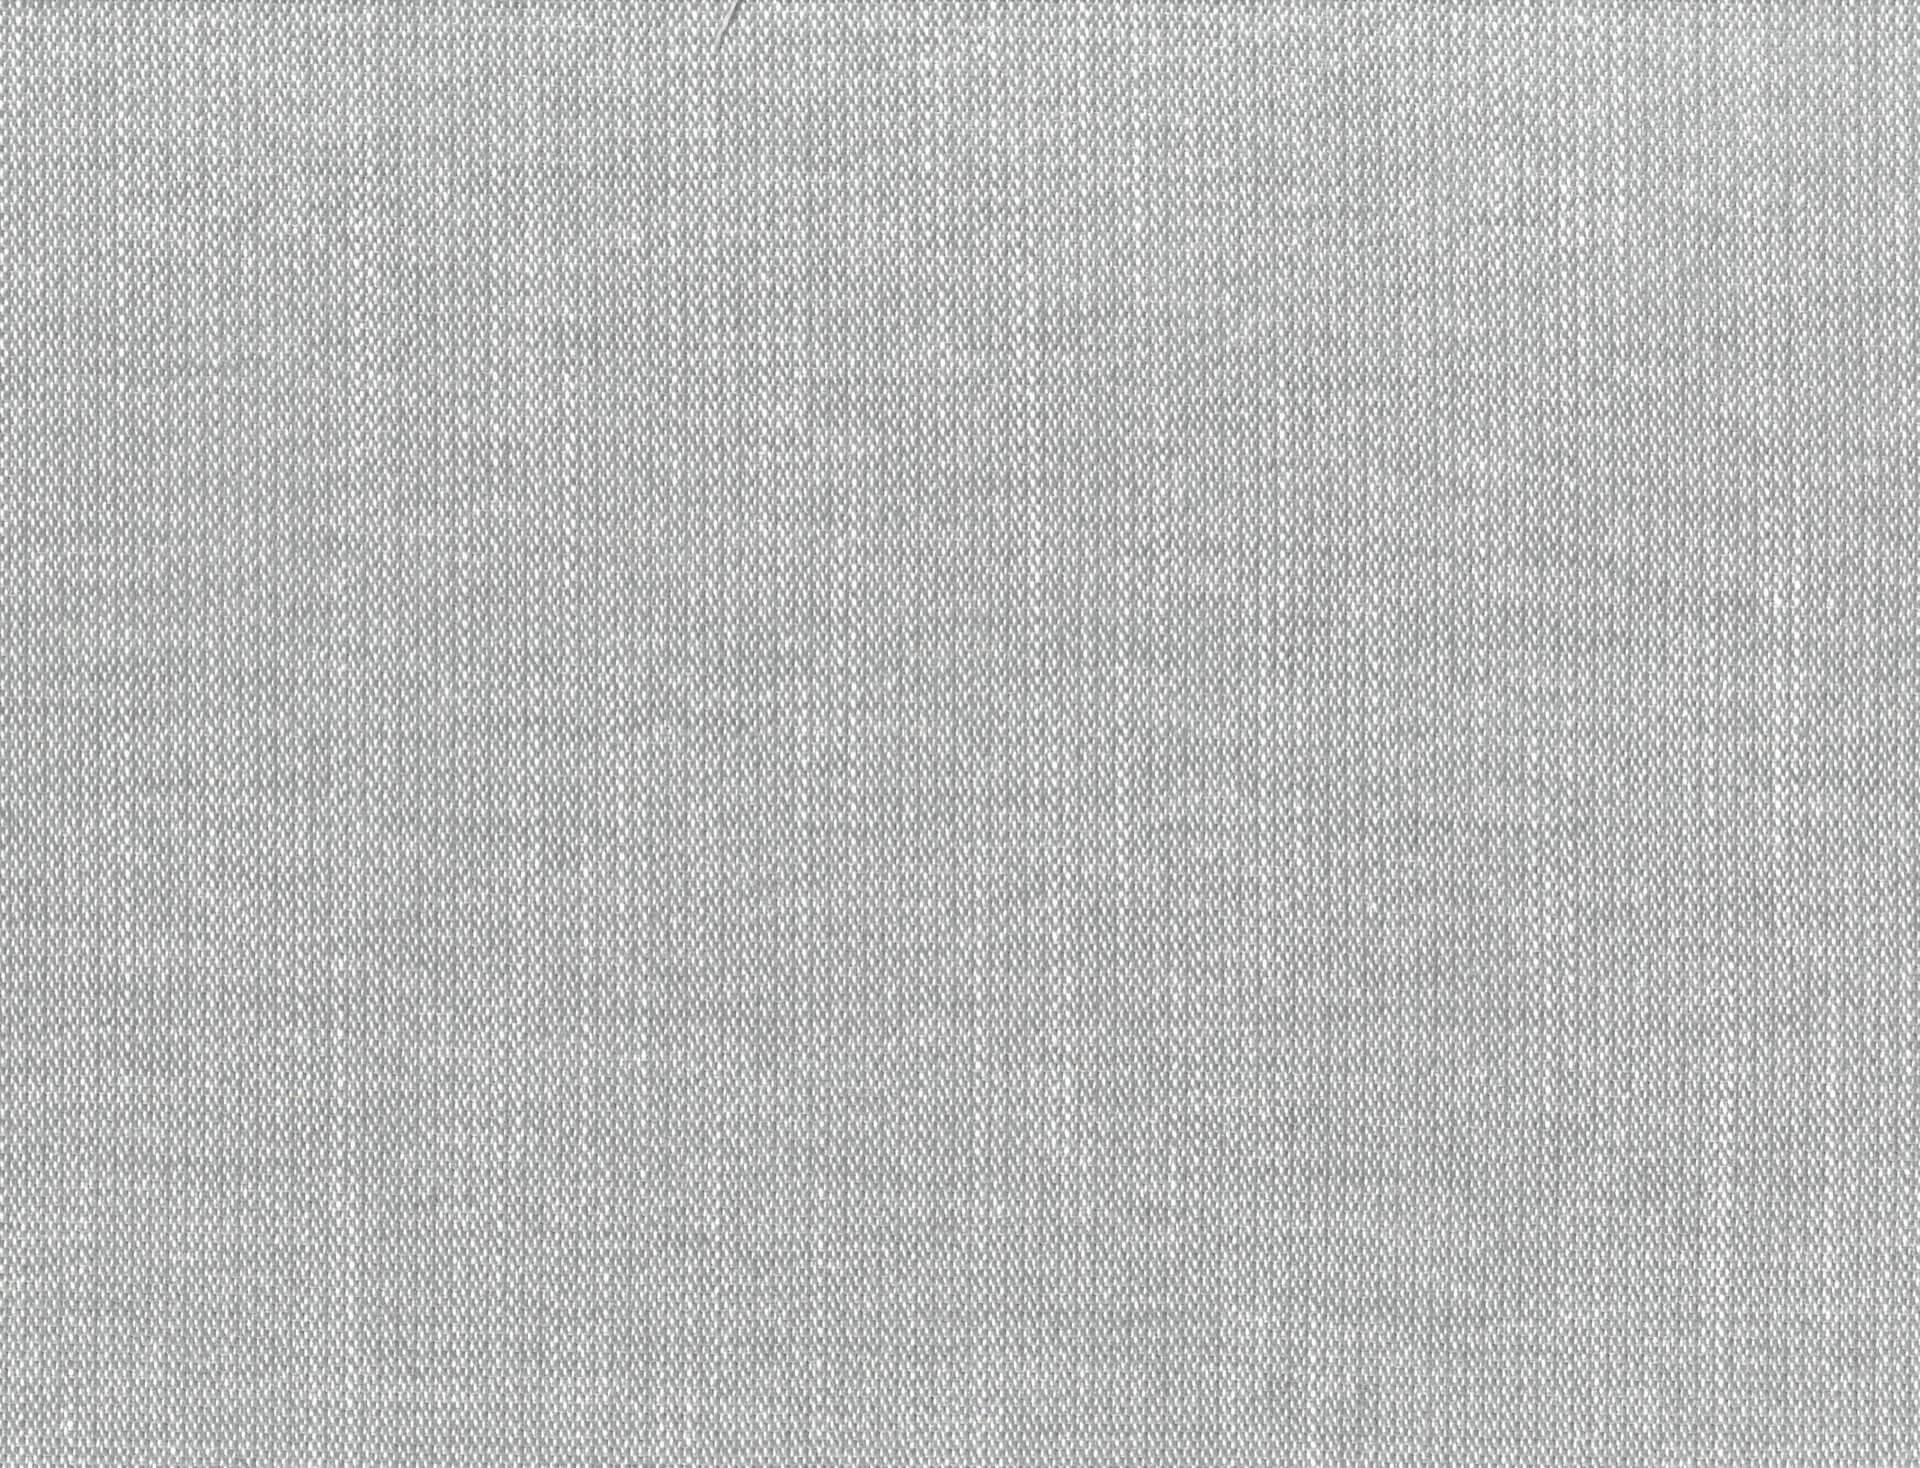 Nori Fabric Light Gray